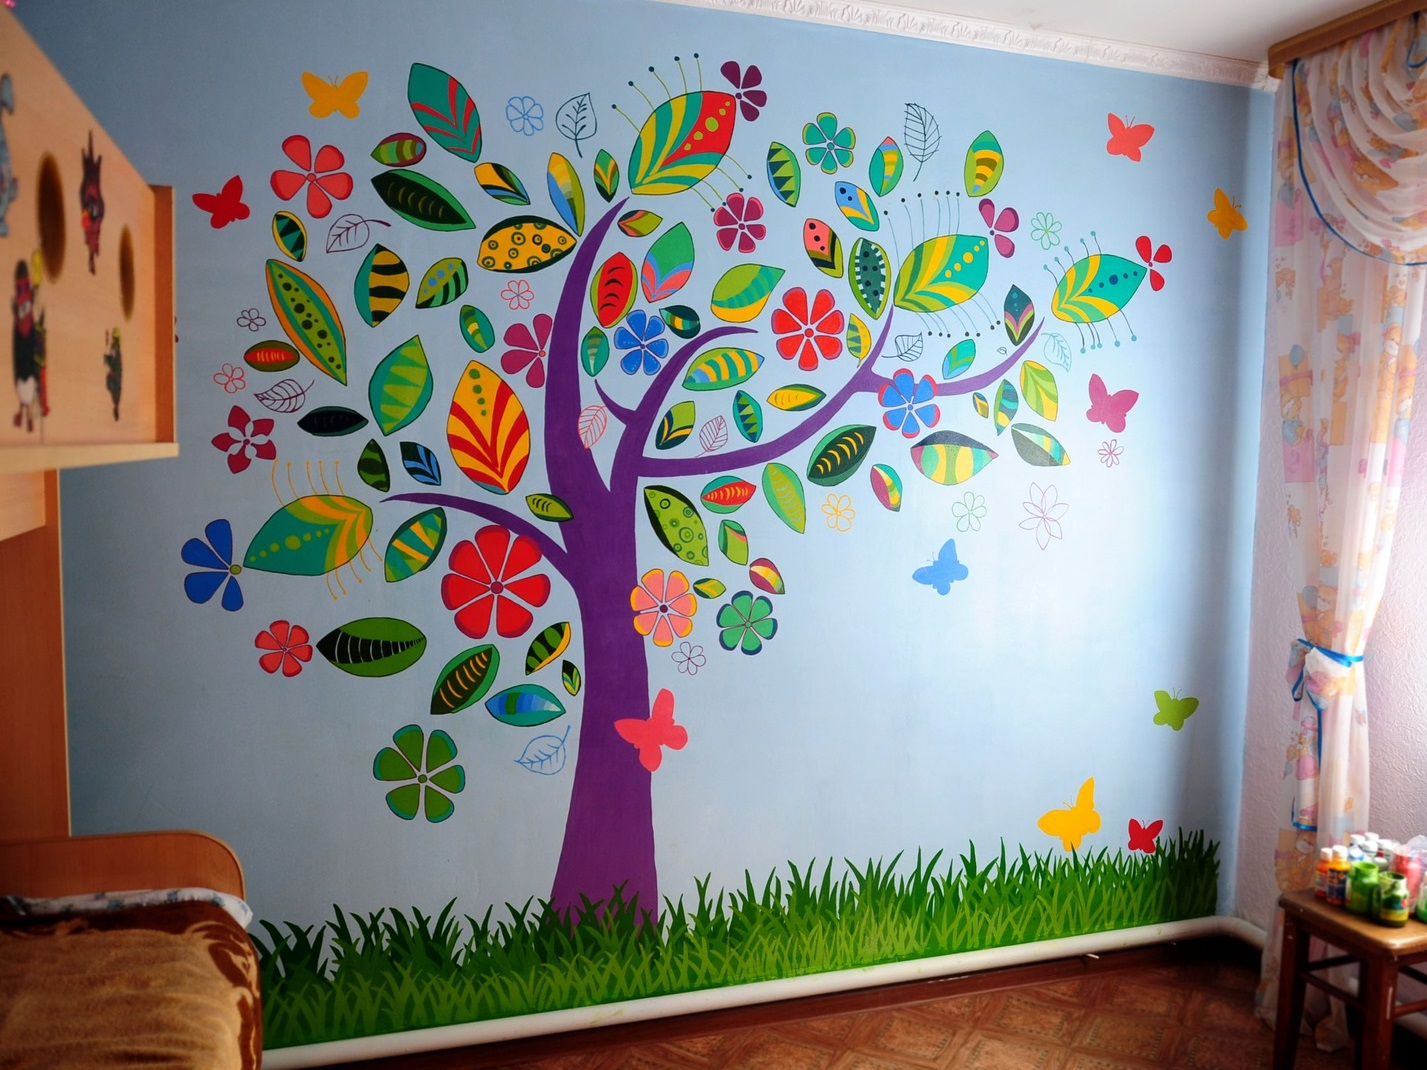 Нарисовать дерево на стене своими руками